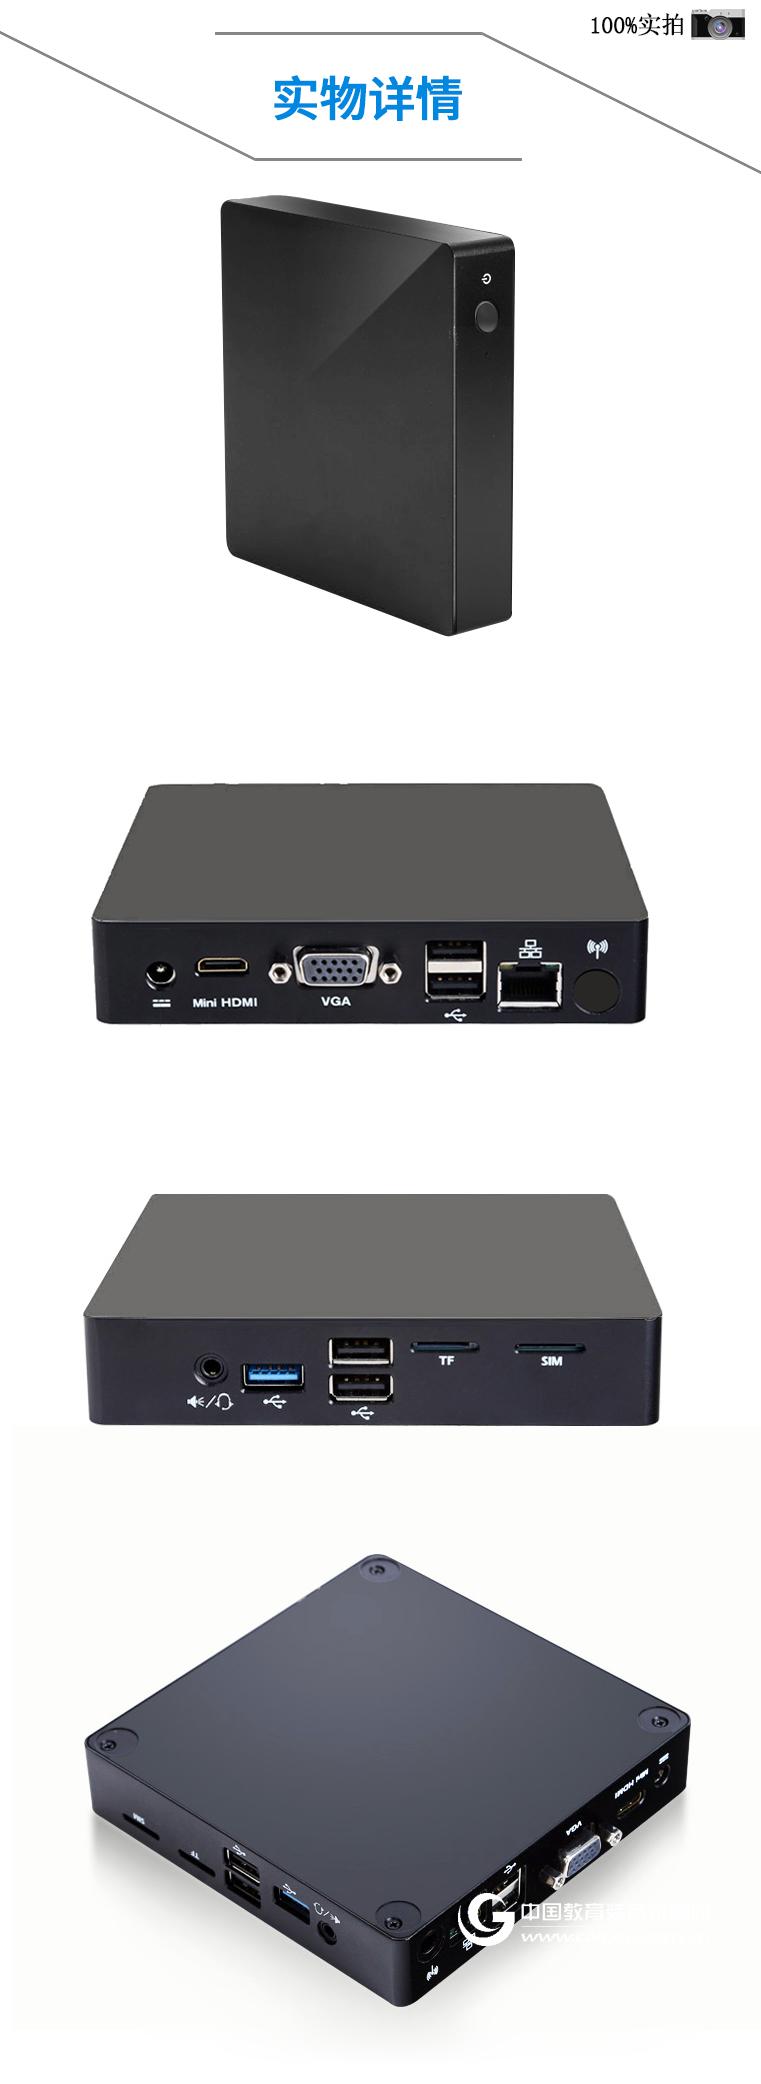 Maxtang大唐Q19迷你电脑主机四核J1900微型台式机htpc瘦客户机NUC云终端